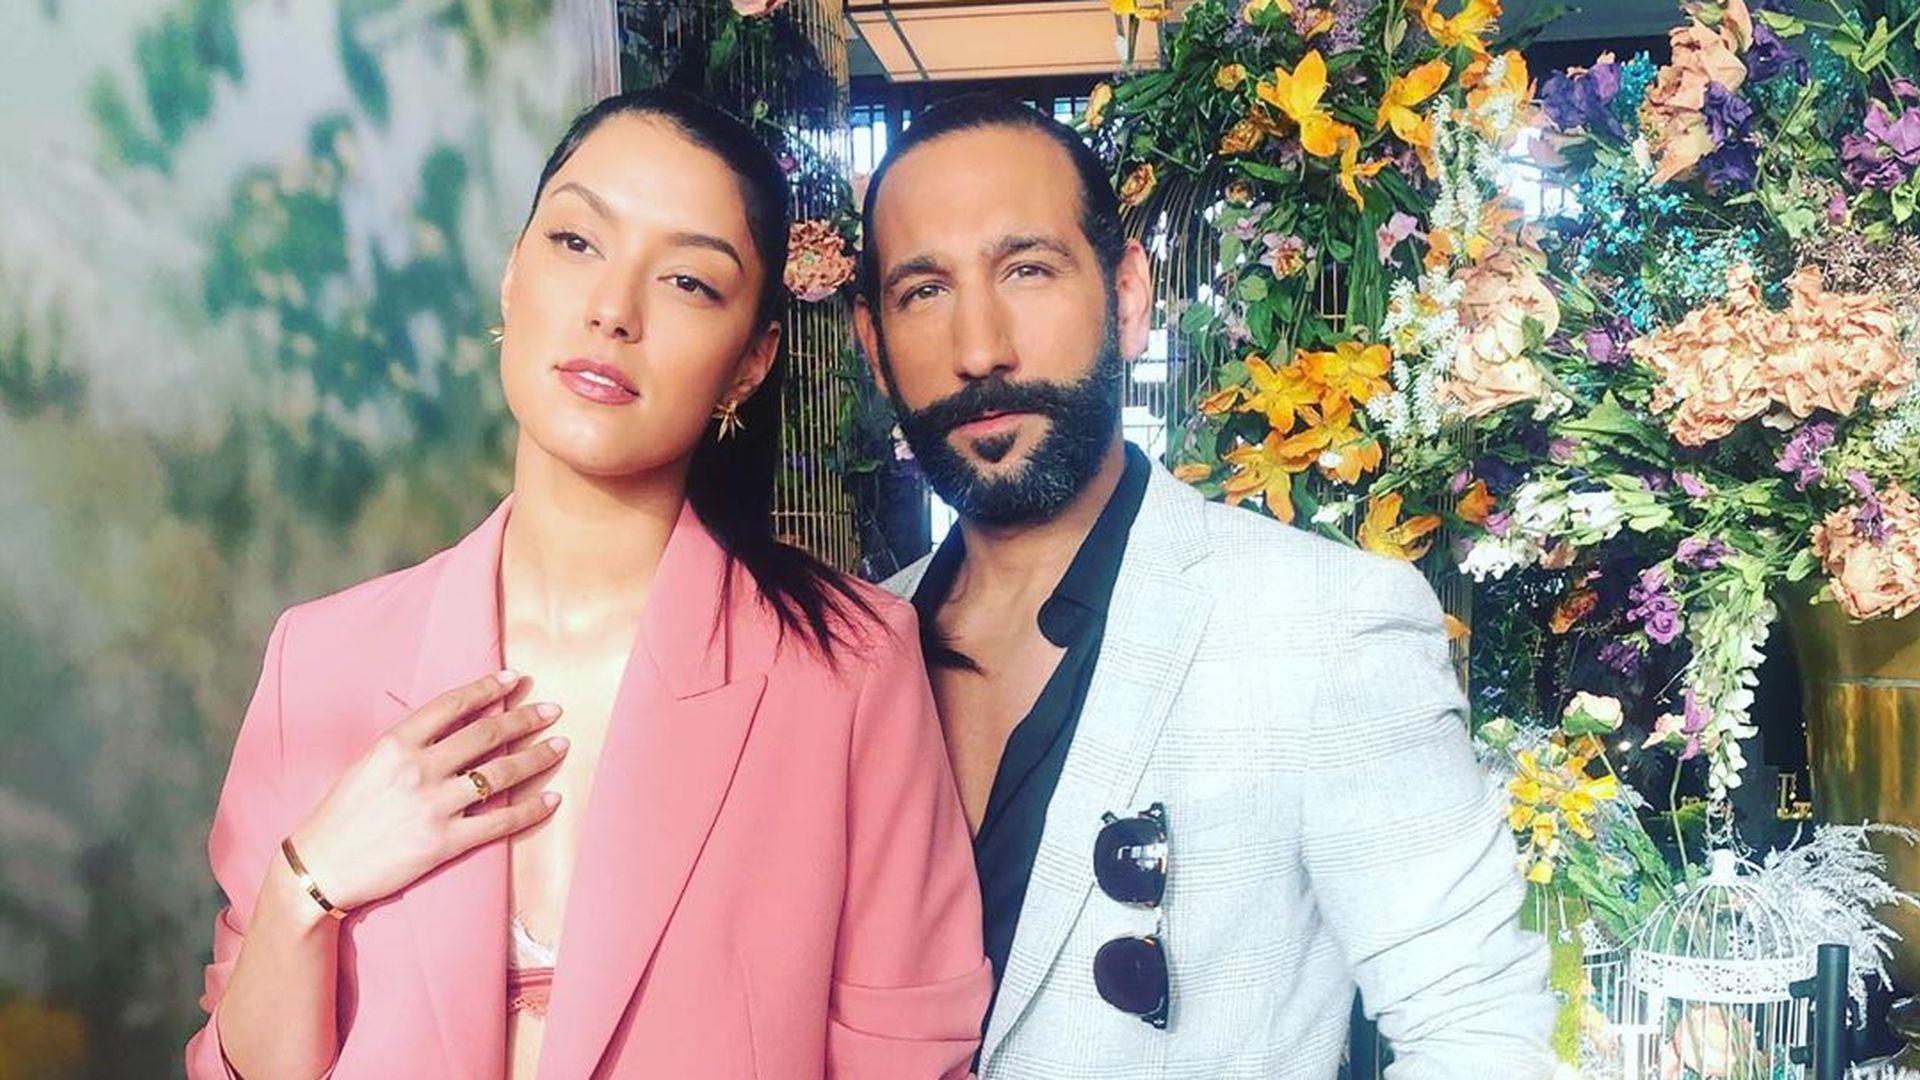 Llambi gratuliert: Erwarten Massimo und Rebecca Nachwuchs?